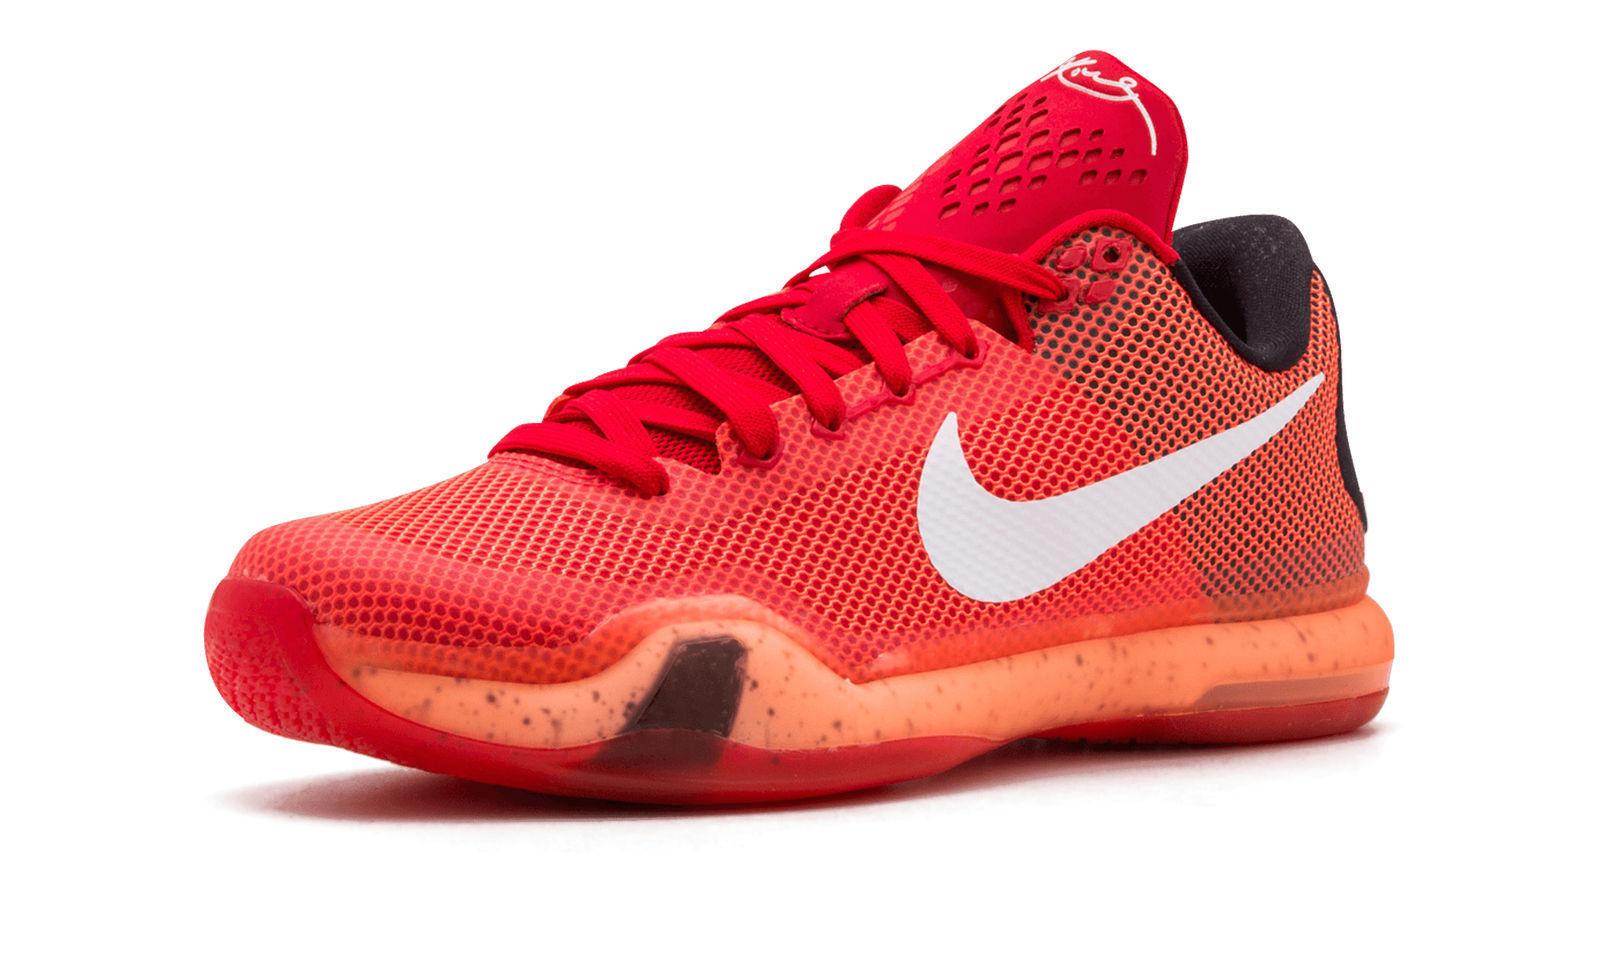 63d92af668b6 Nike KD X University Red White Bright Crimson Kevin Durant Mens Shoes  705317 616